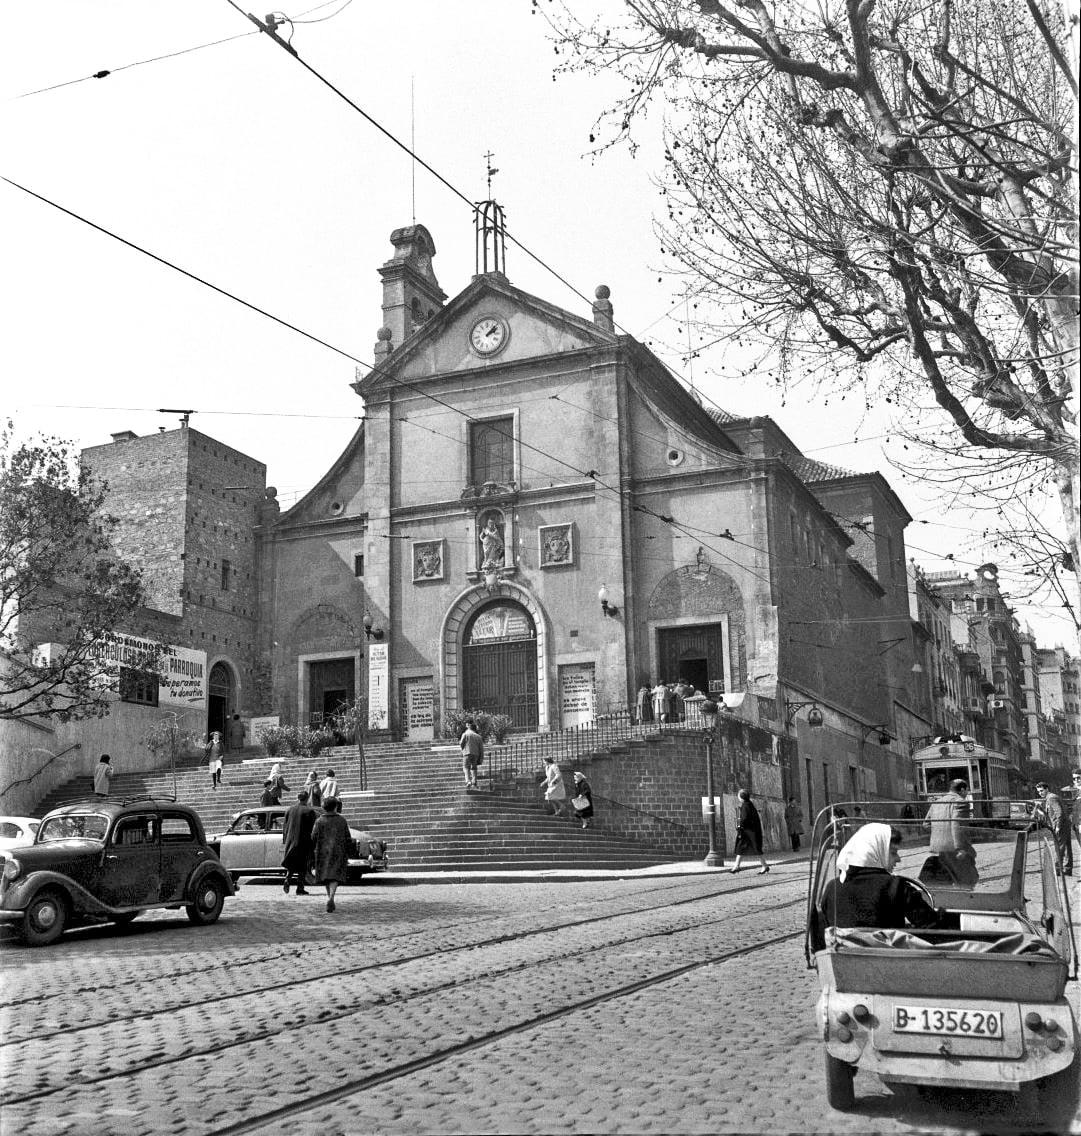 Església de la Mare de Déu de Gràcia